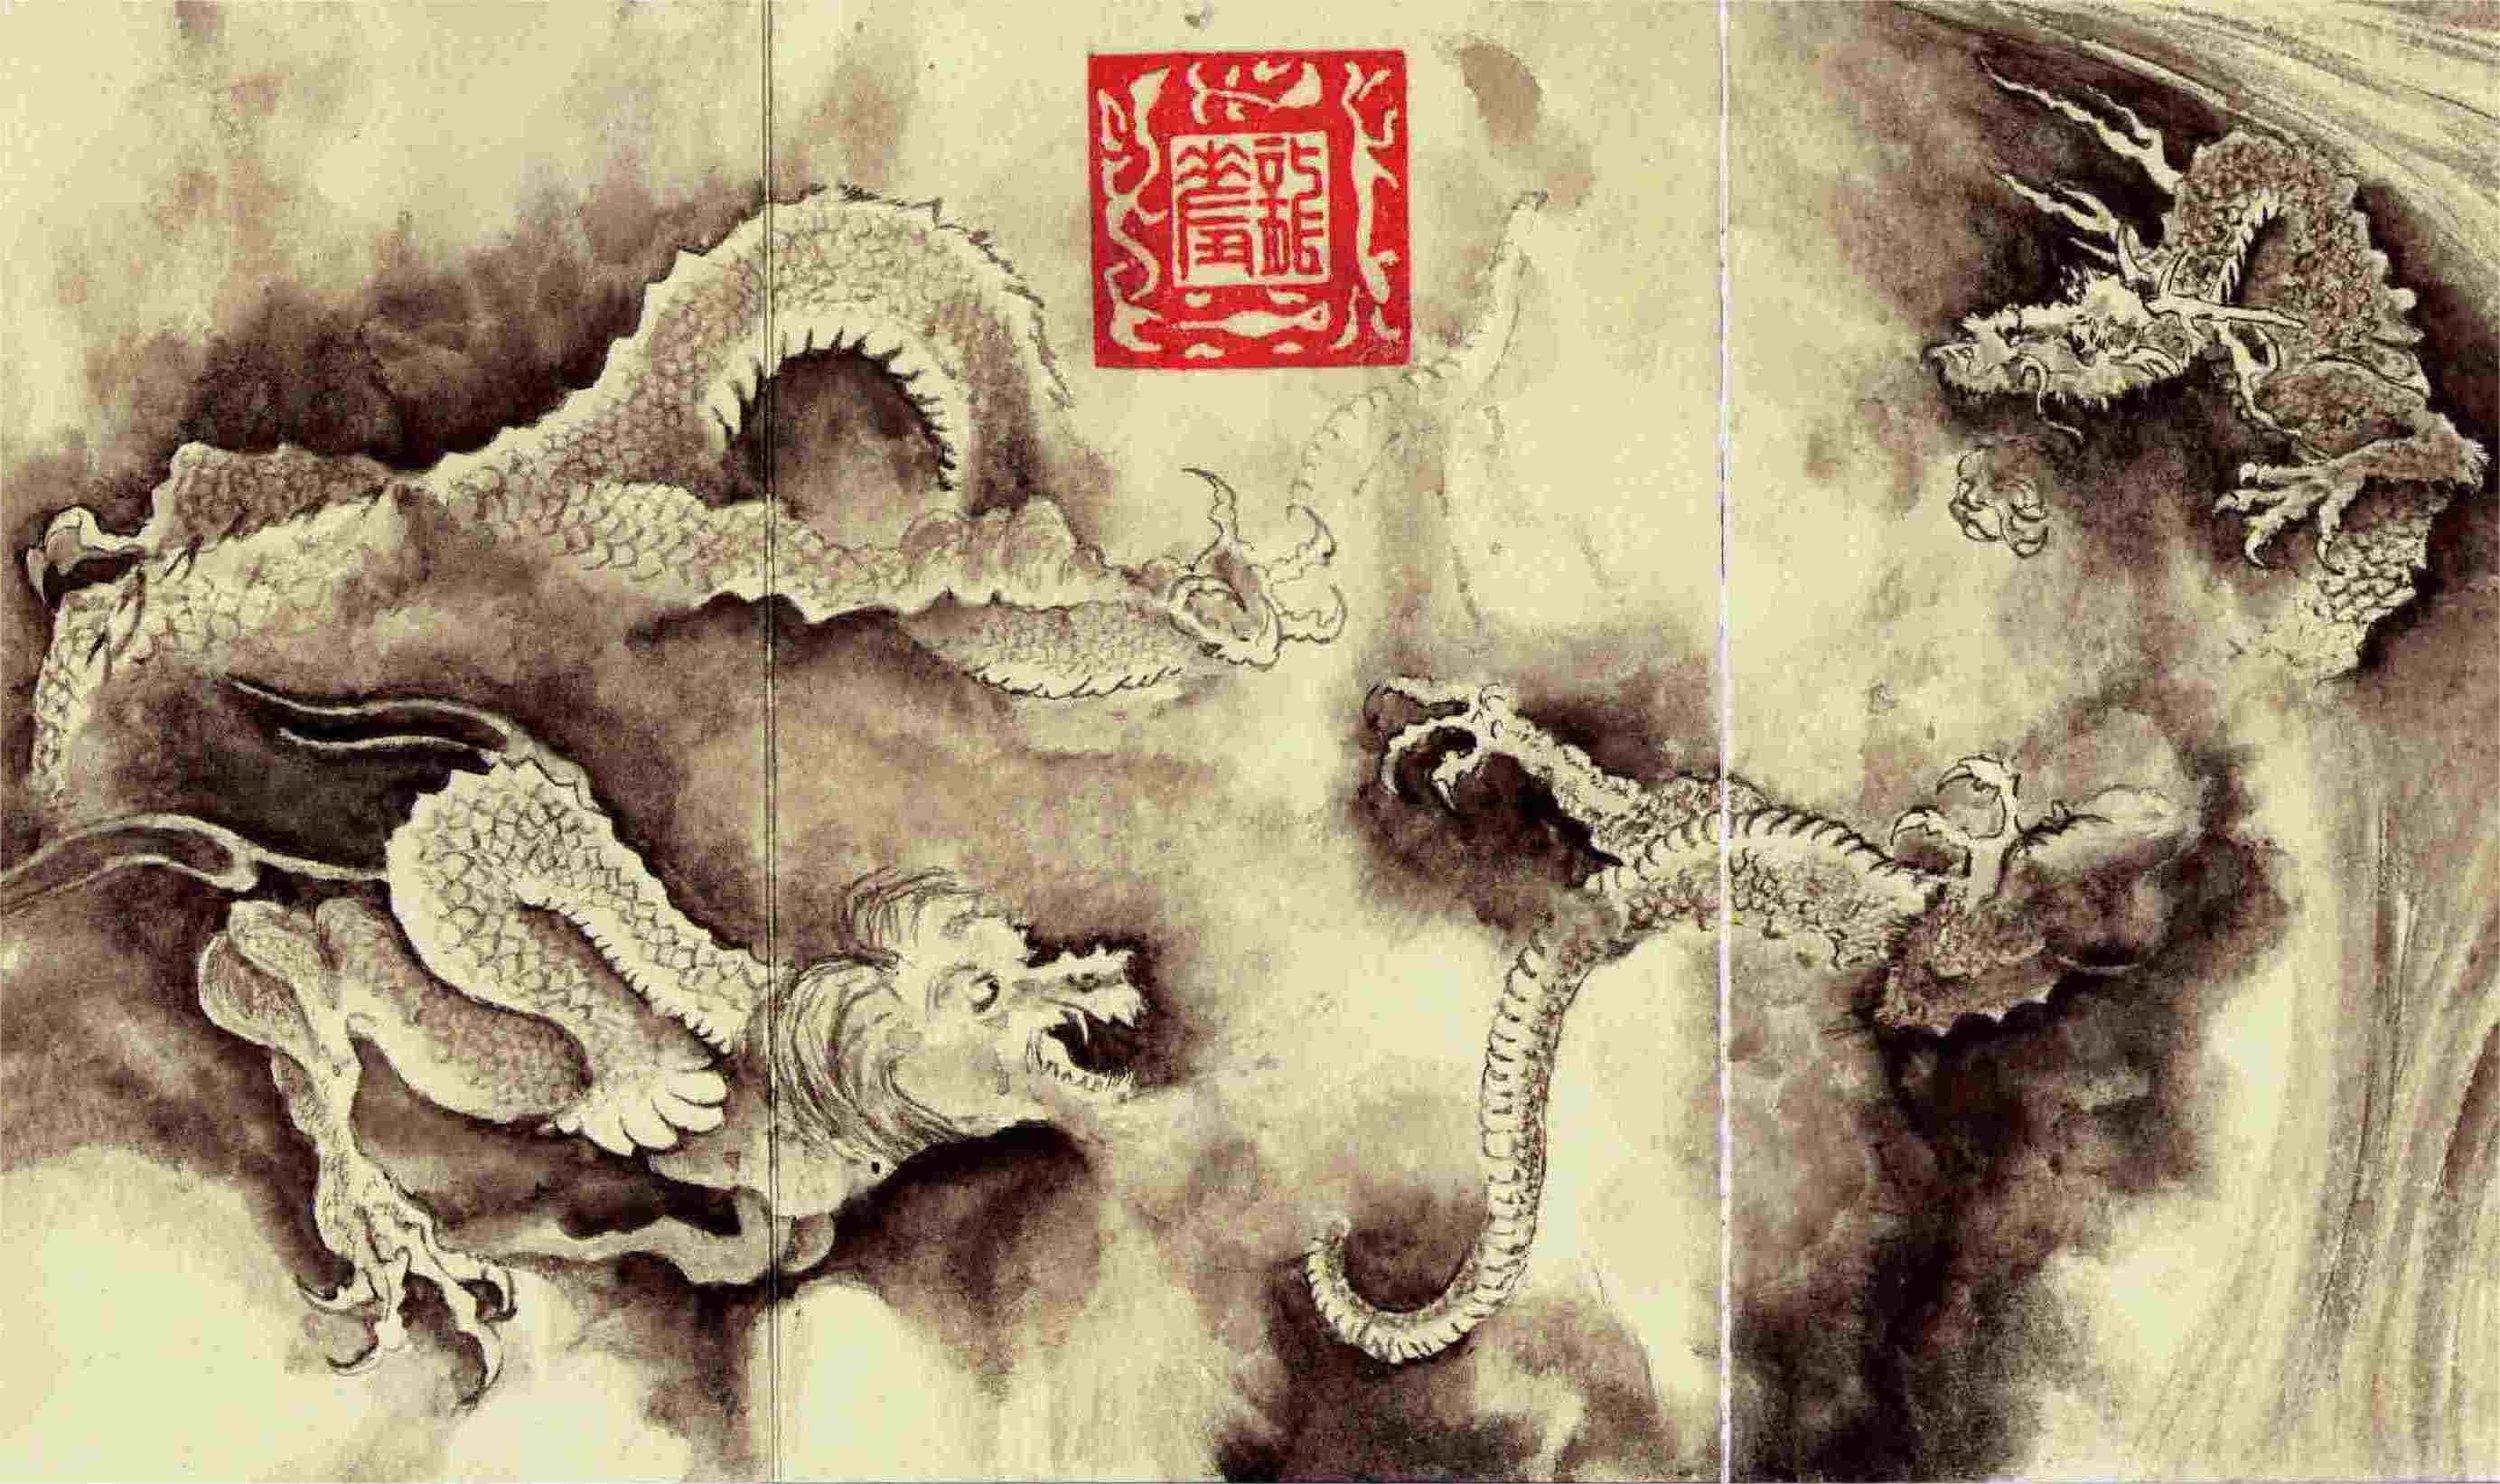 Chen Rong - Nine Dragons